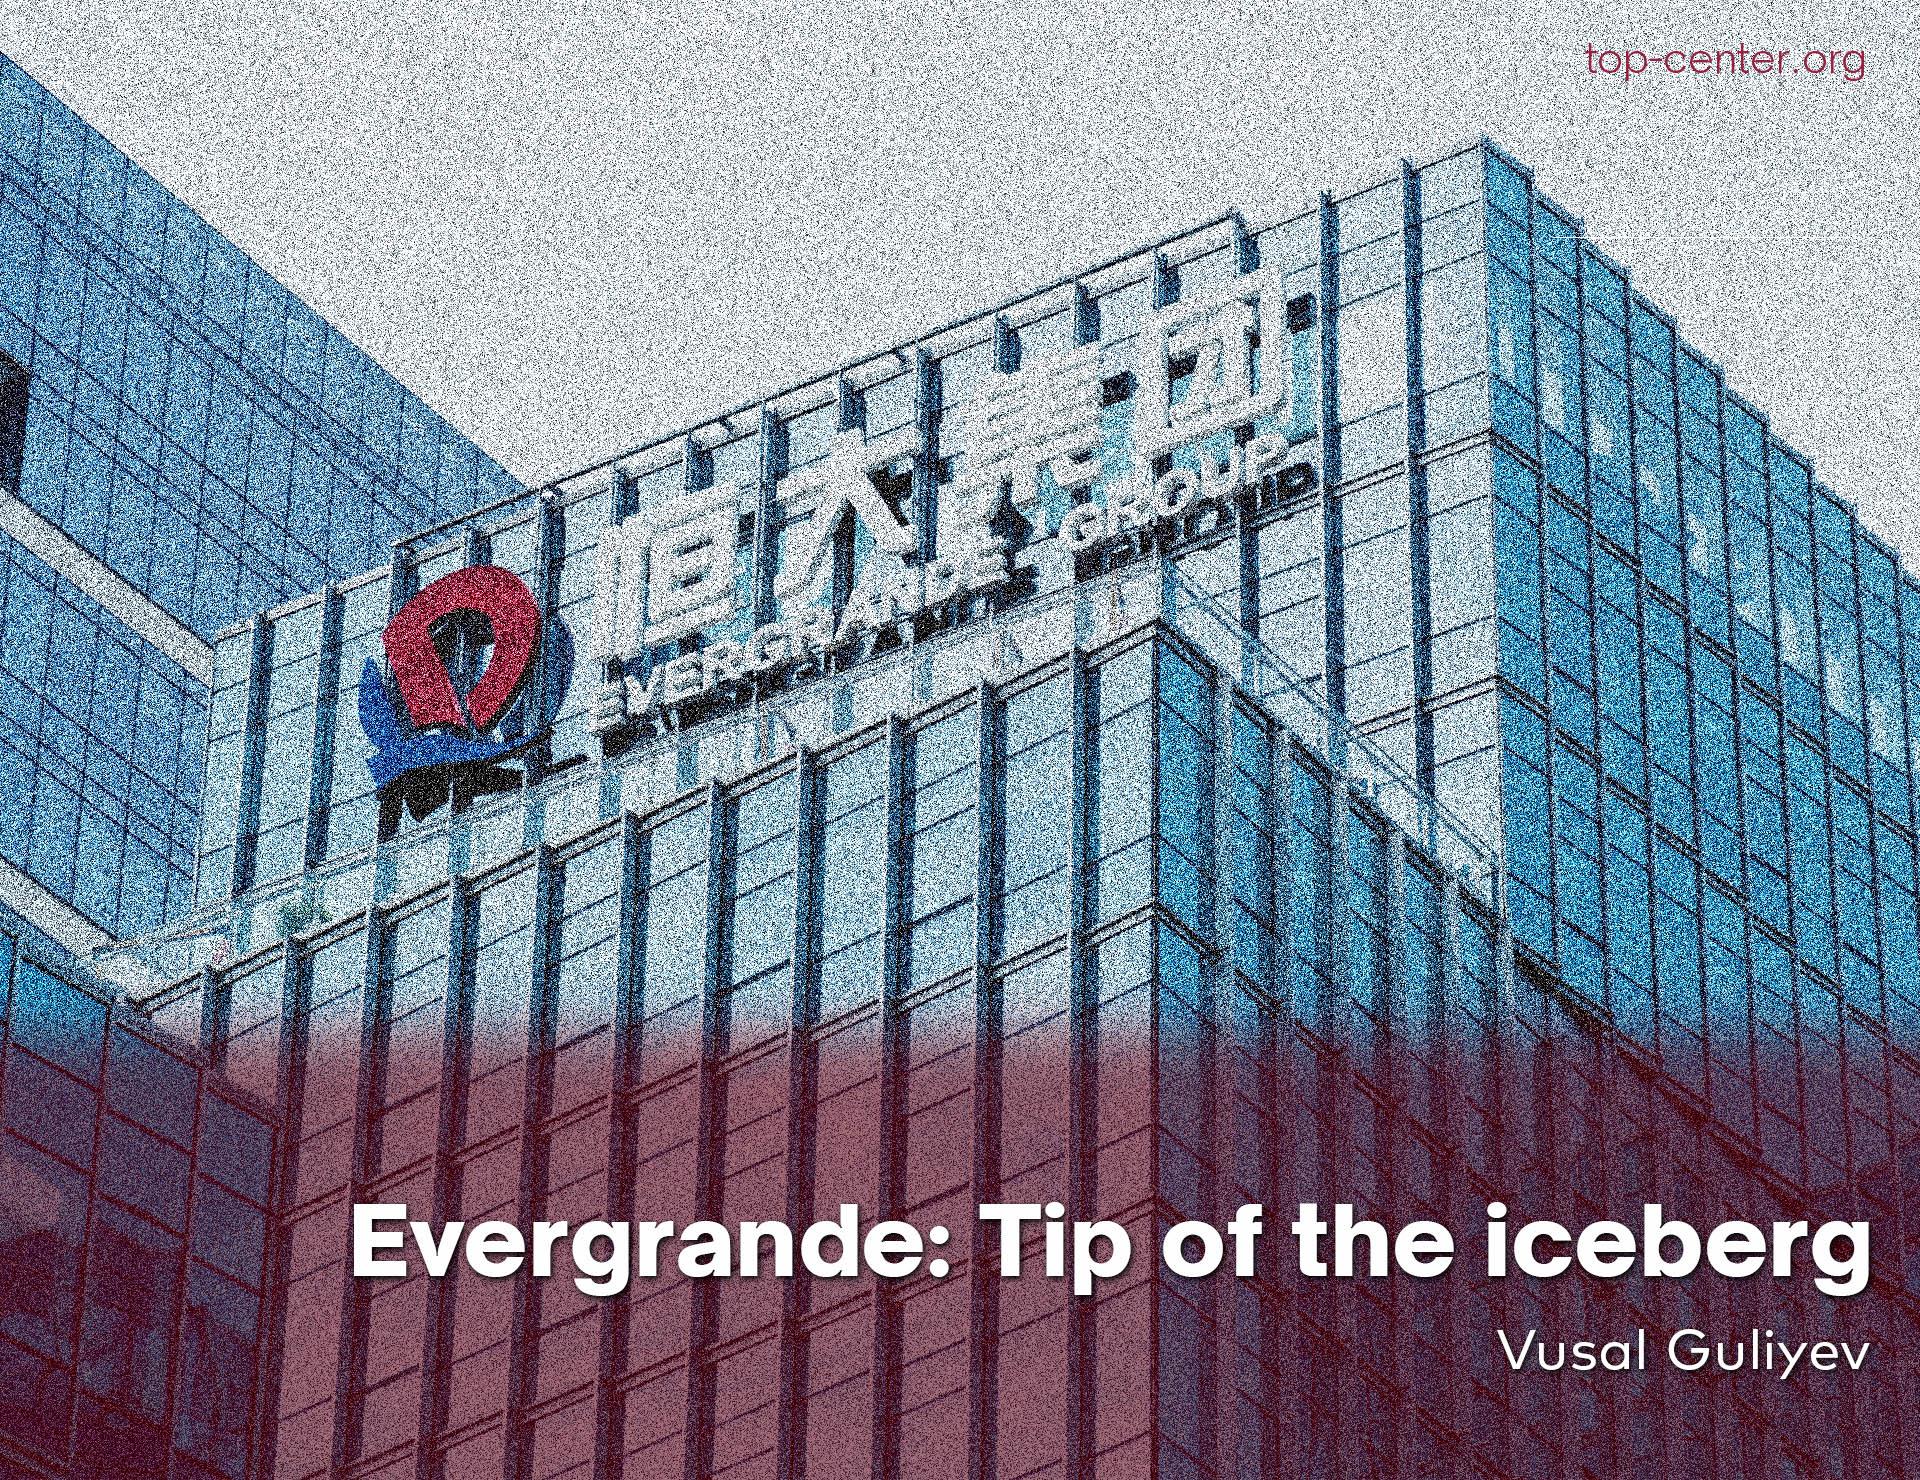 Evergrande: Tip of the iceberg